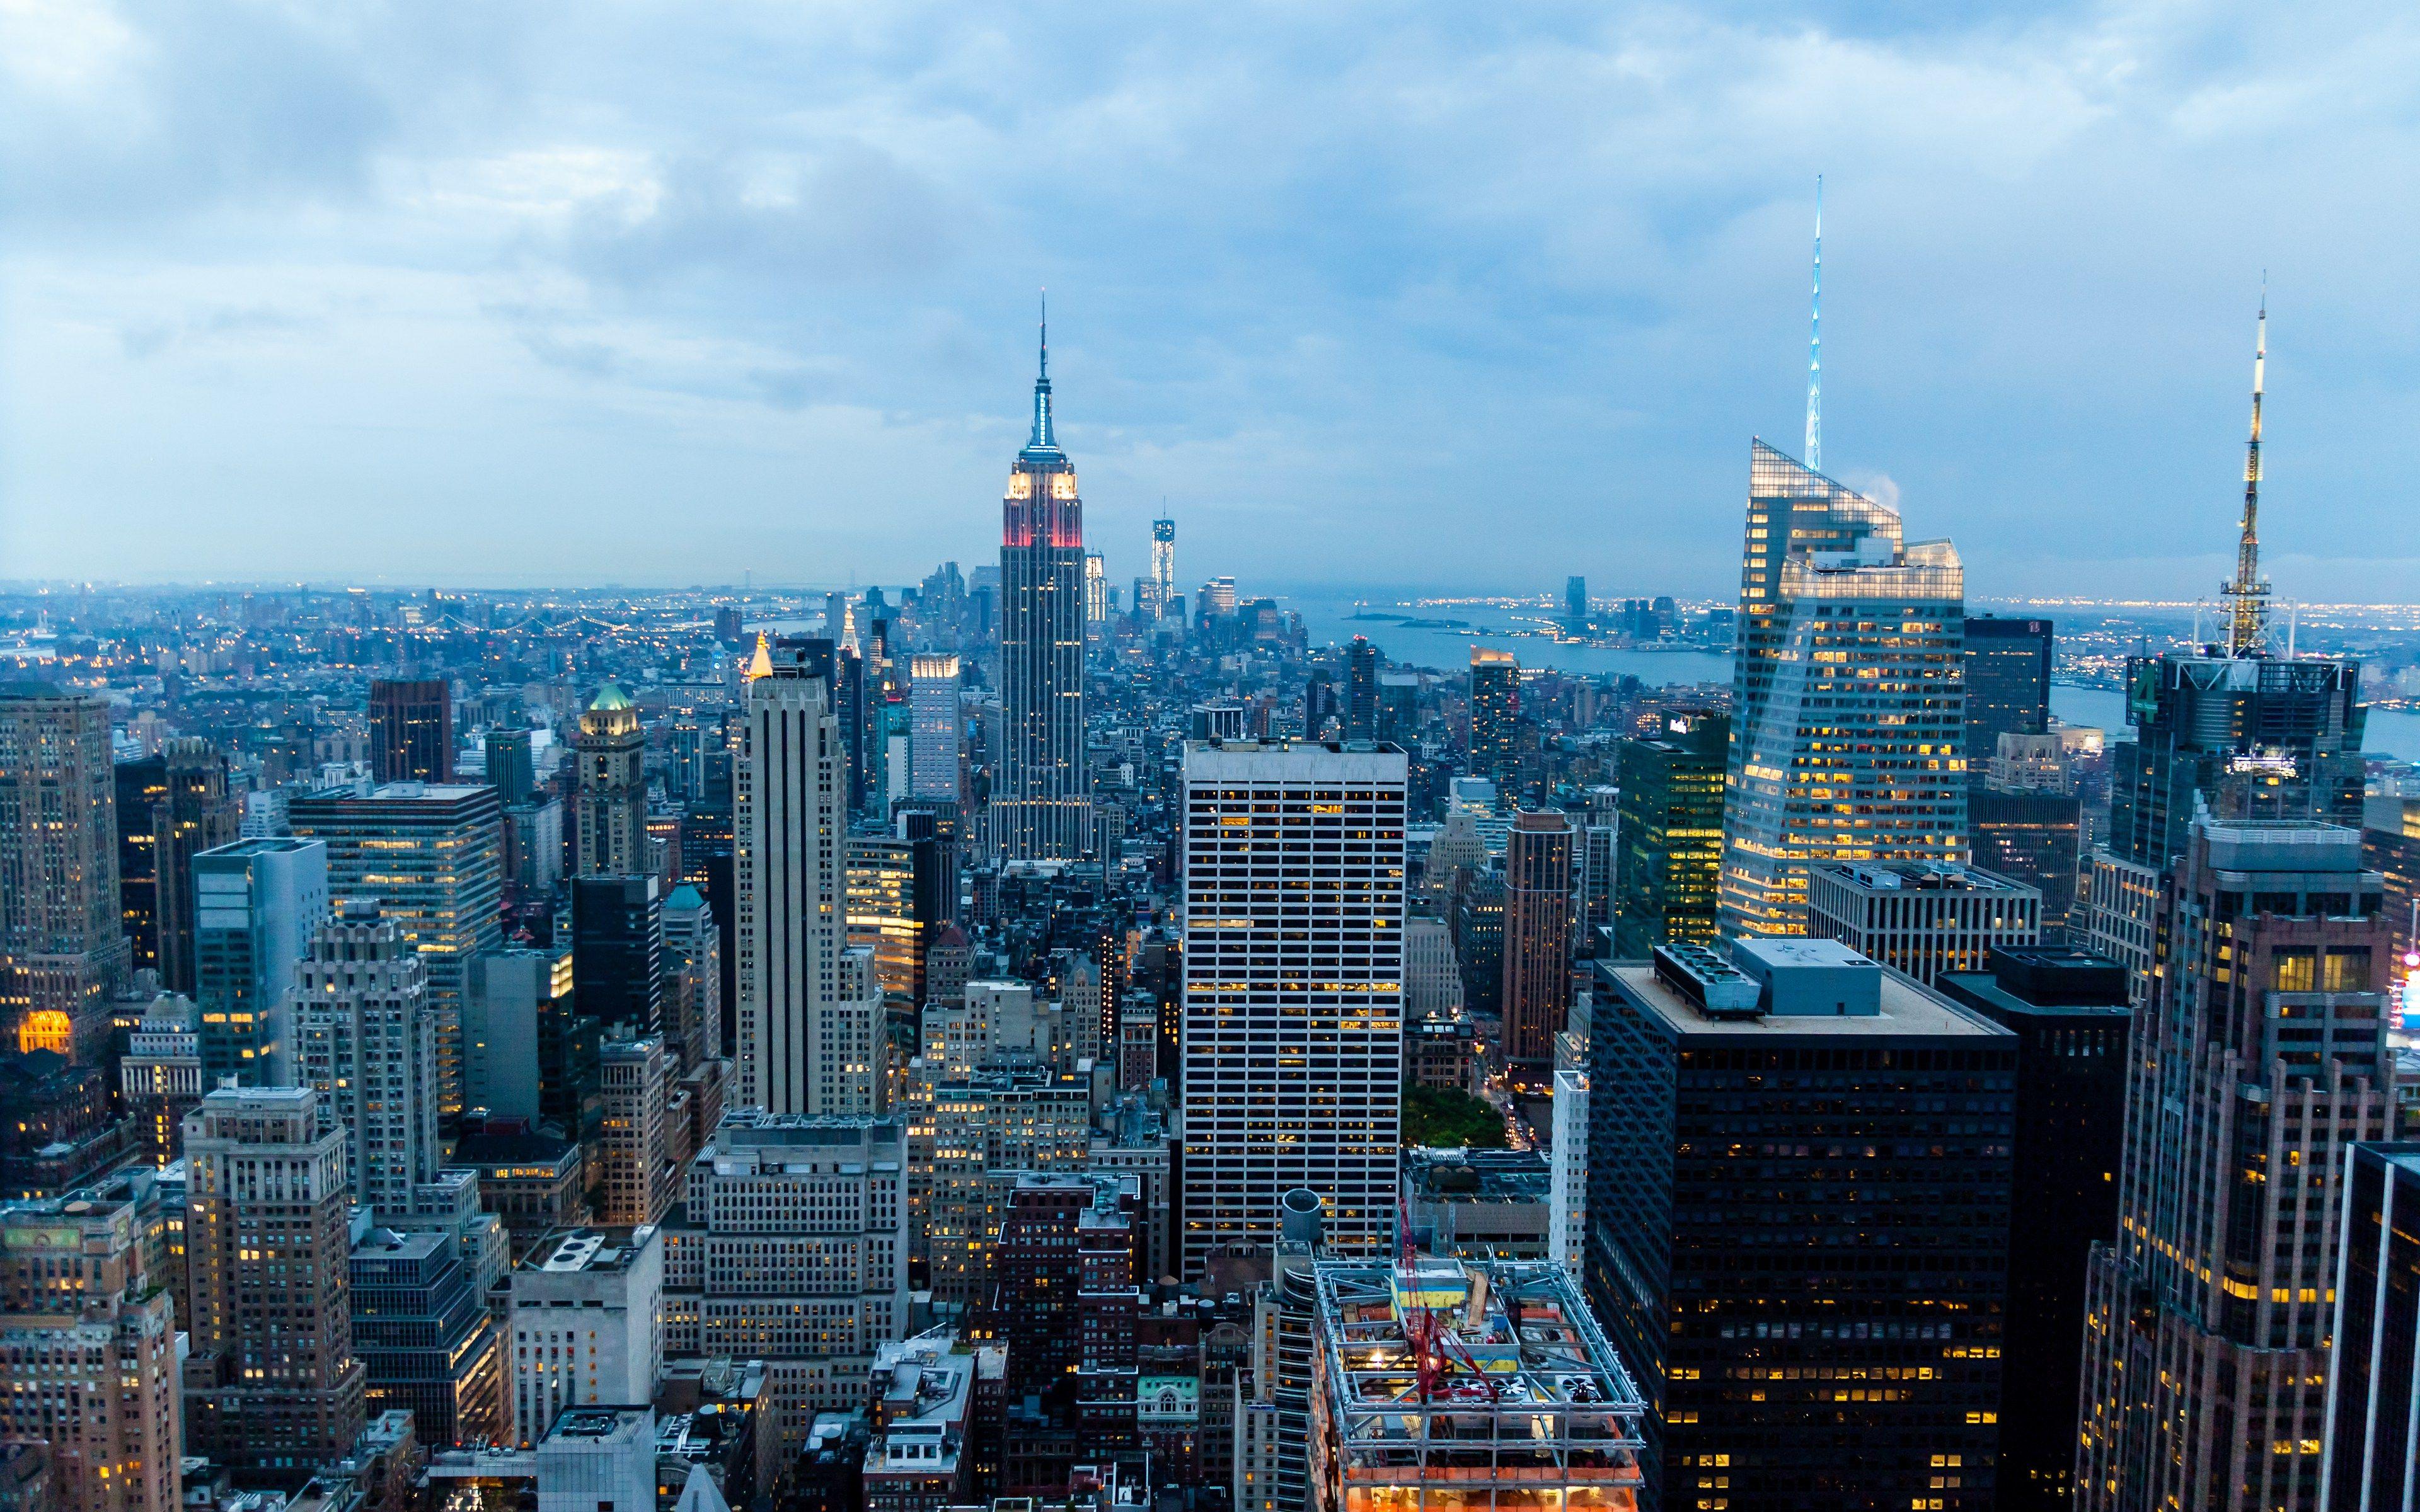 Newyork Hd Wallpapwer Amazing Landscape Download Hd Desktop Mobile Wallpaper And Background I Aesthetic Desktop Wallpaper Manhattan Wallpaper Background Images